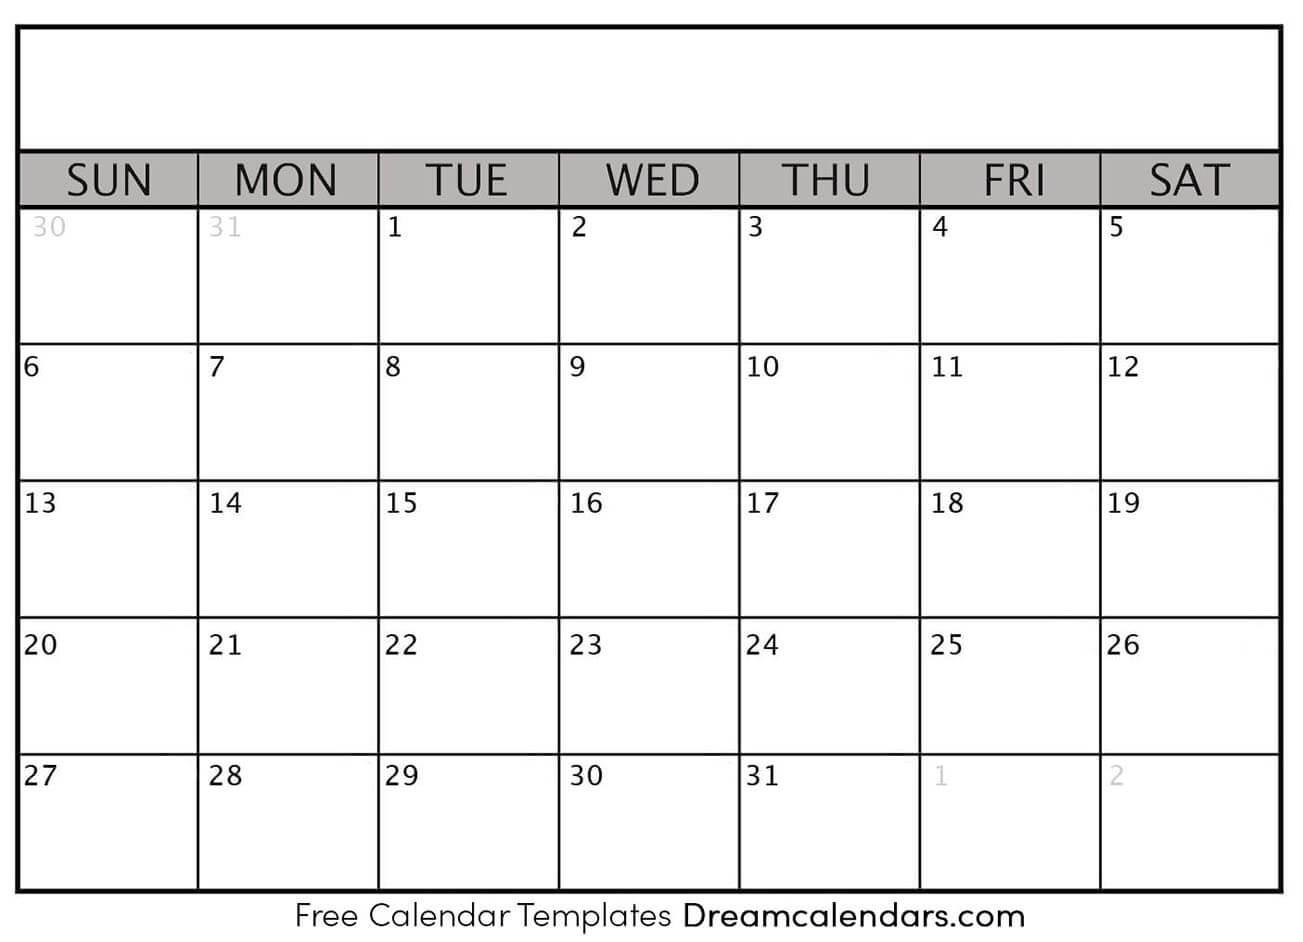 Printable Blank Calendar 2020 | Dream Calendars-Blank Calendar 2020 To Fill In